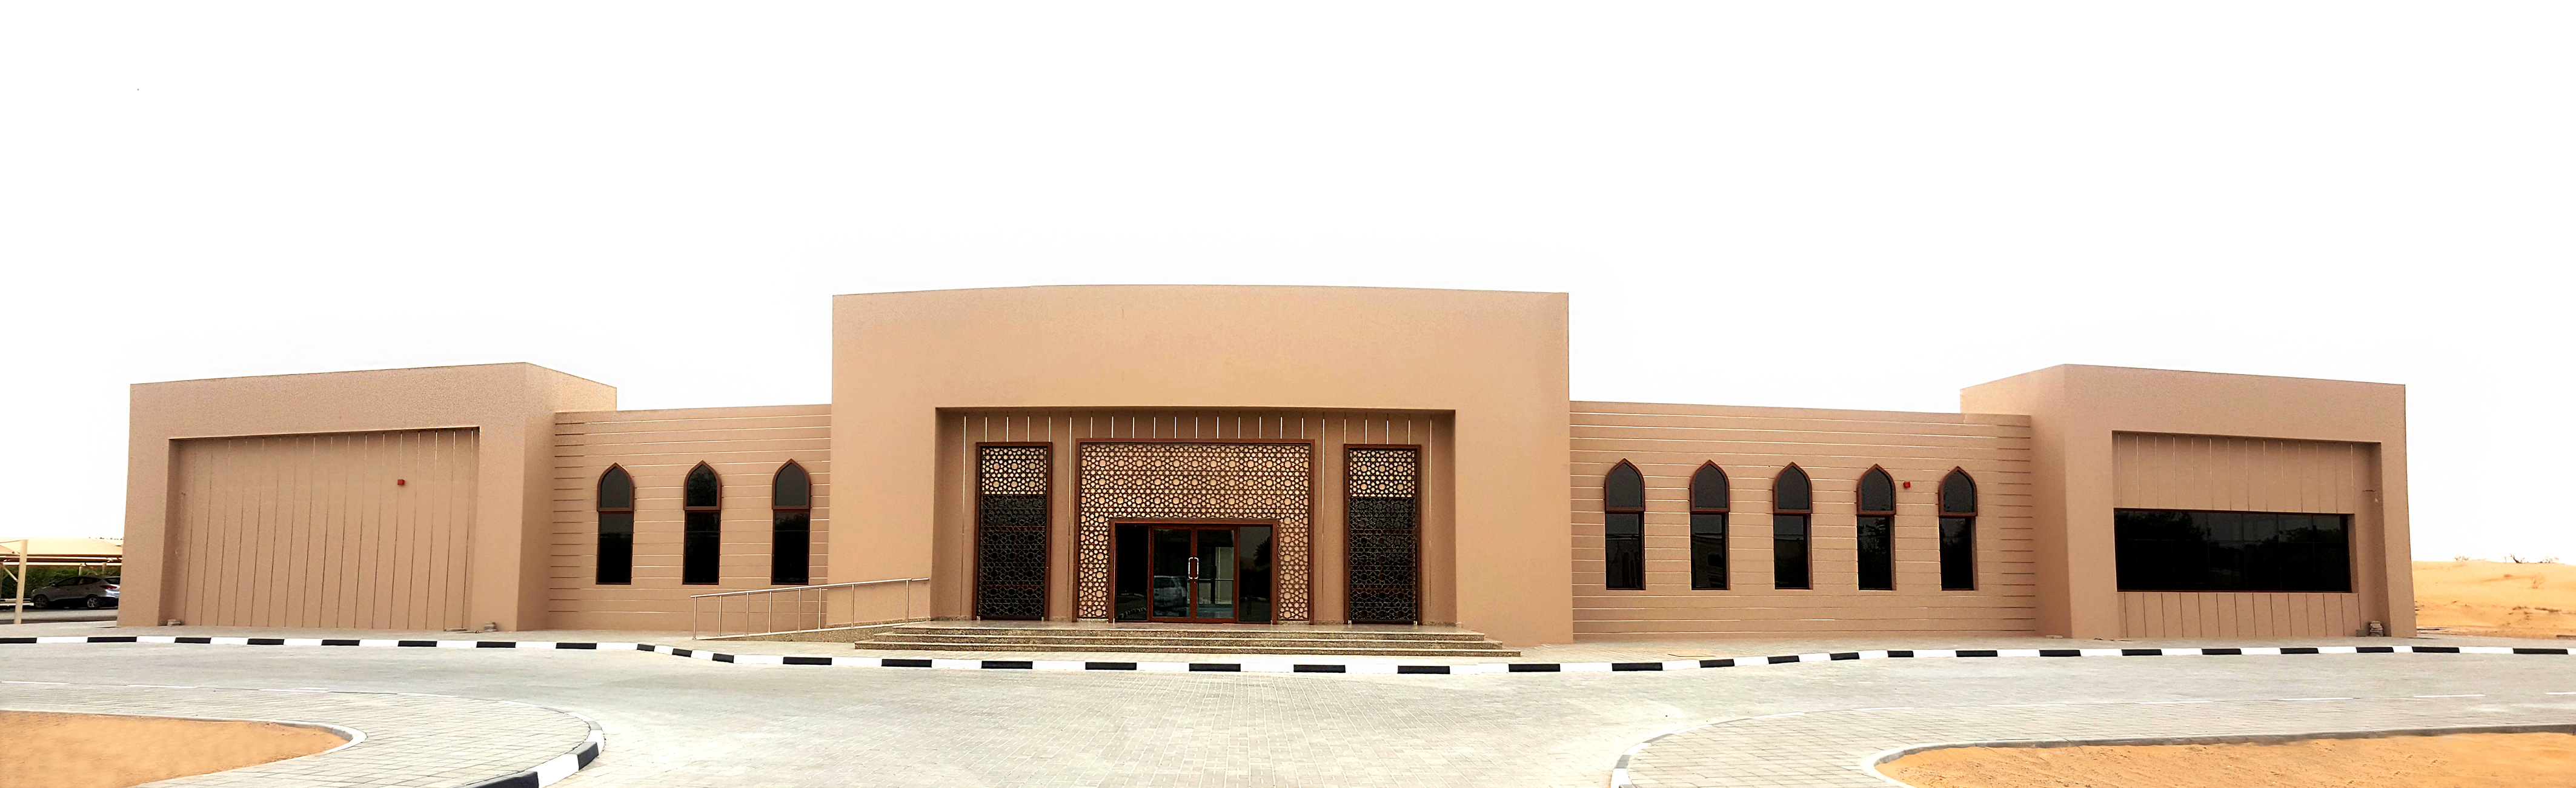 Administration building enviroment